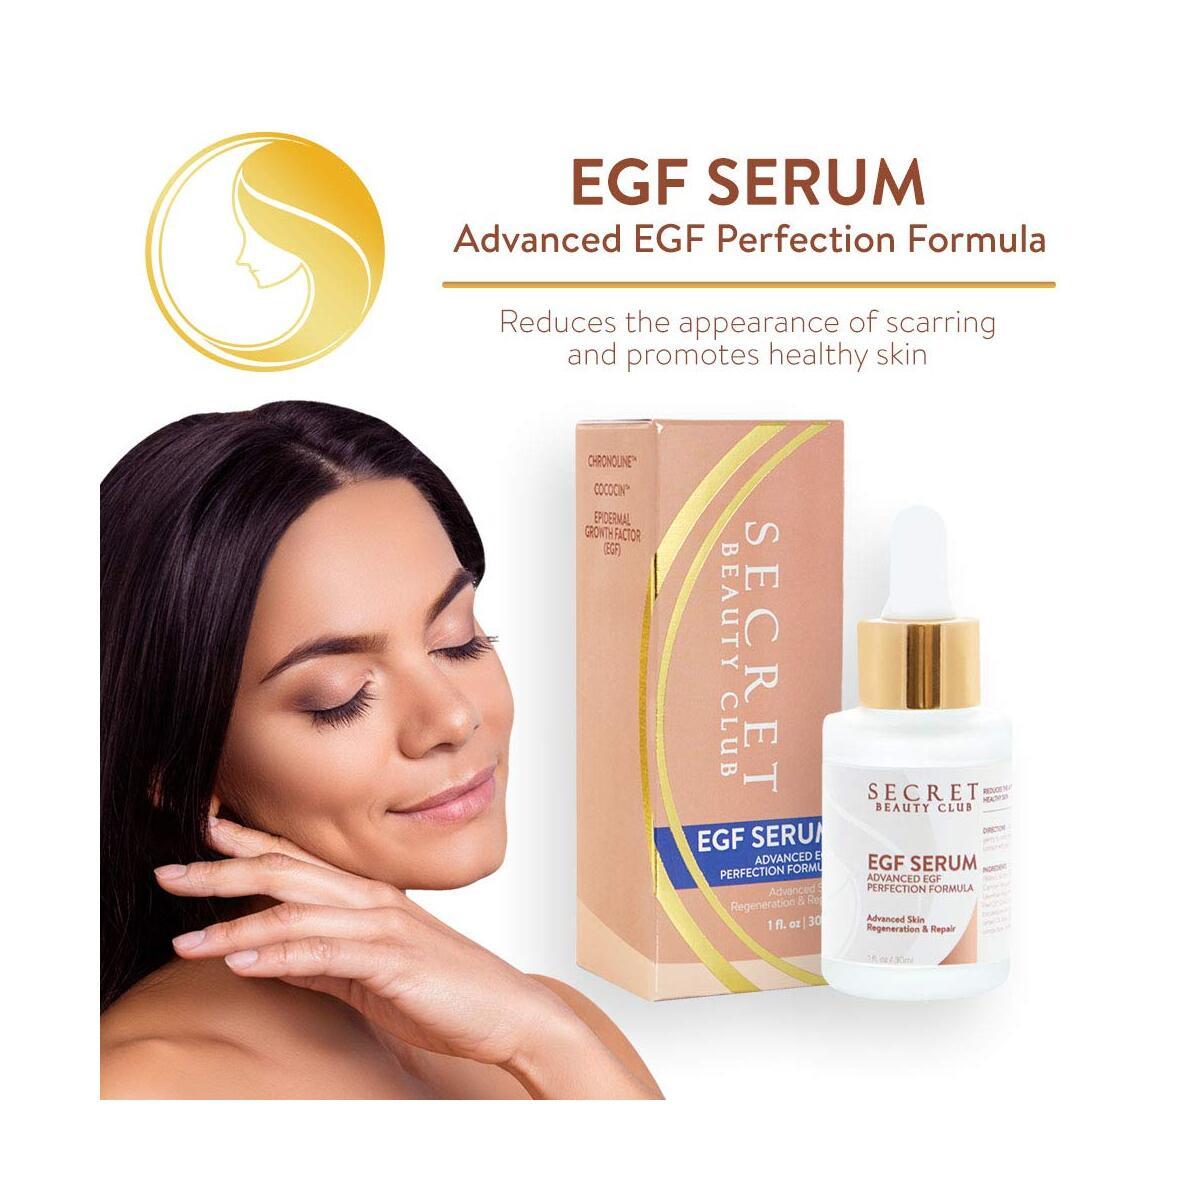 EGF Serum – Our Best Skin Regeneration & Repair Serum – Scar Reducing - Diminish Appearance of Fine Lines, Wrinkles, Acne Scars & Blemishes